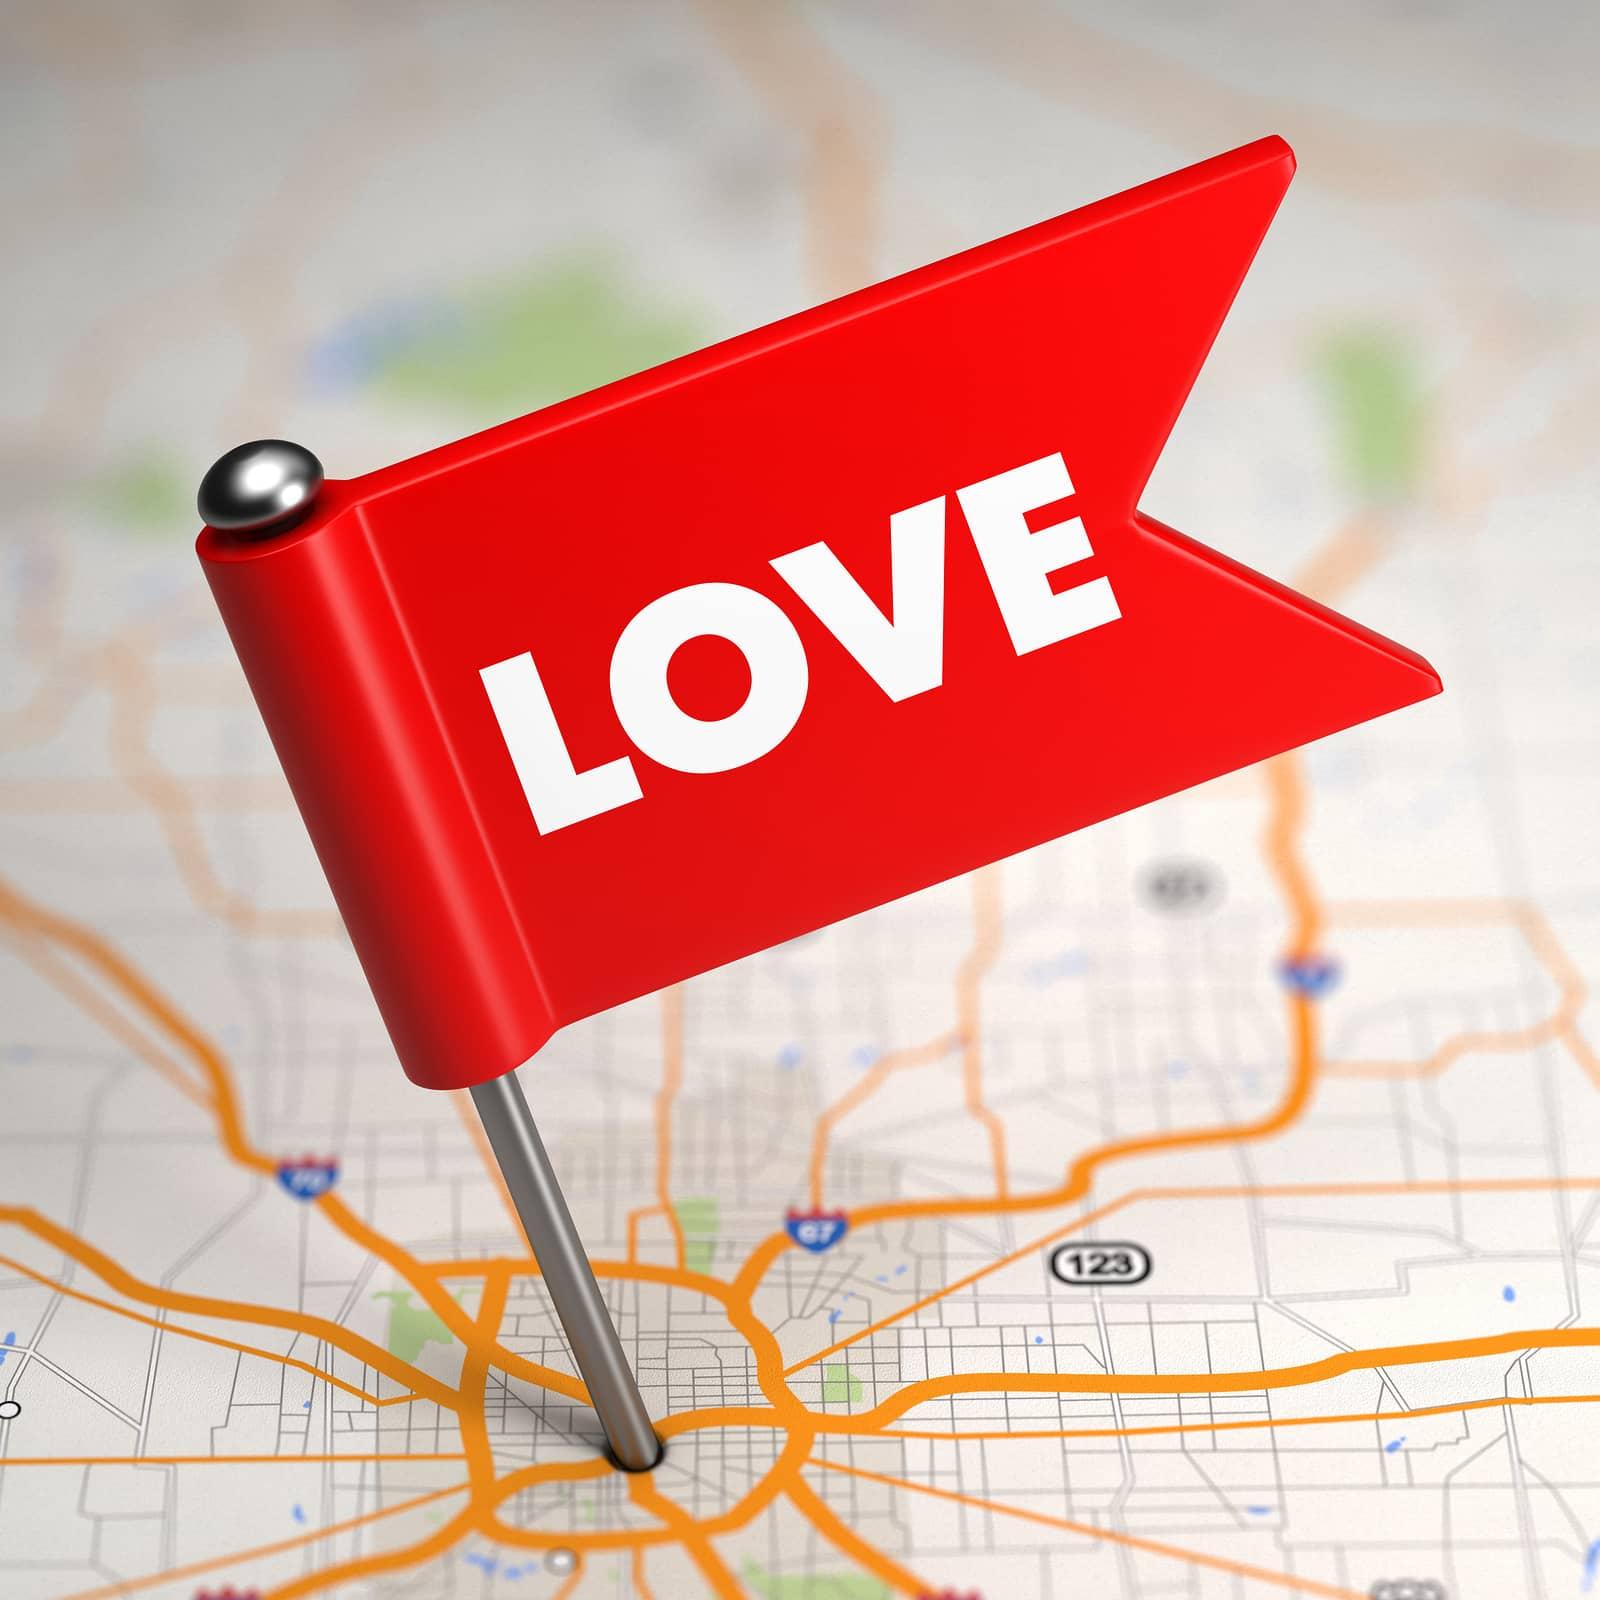 a red love flag